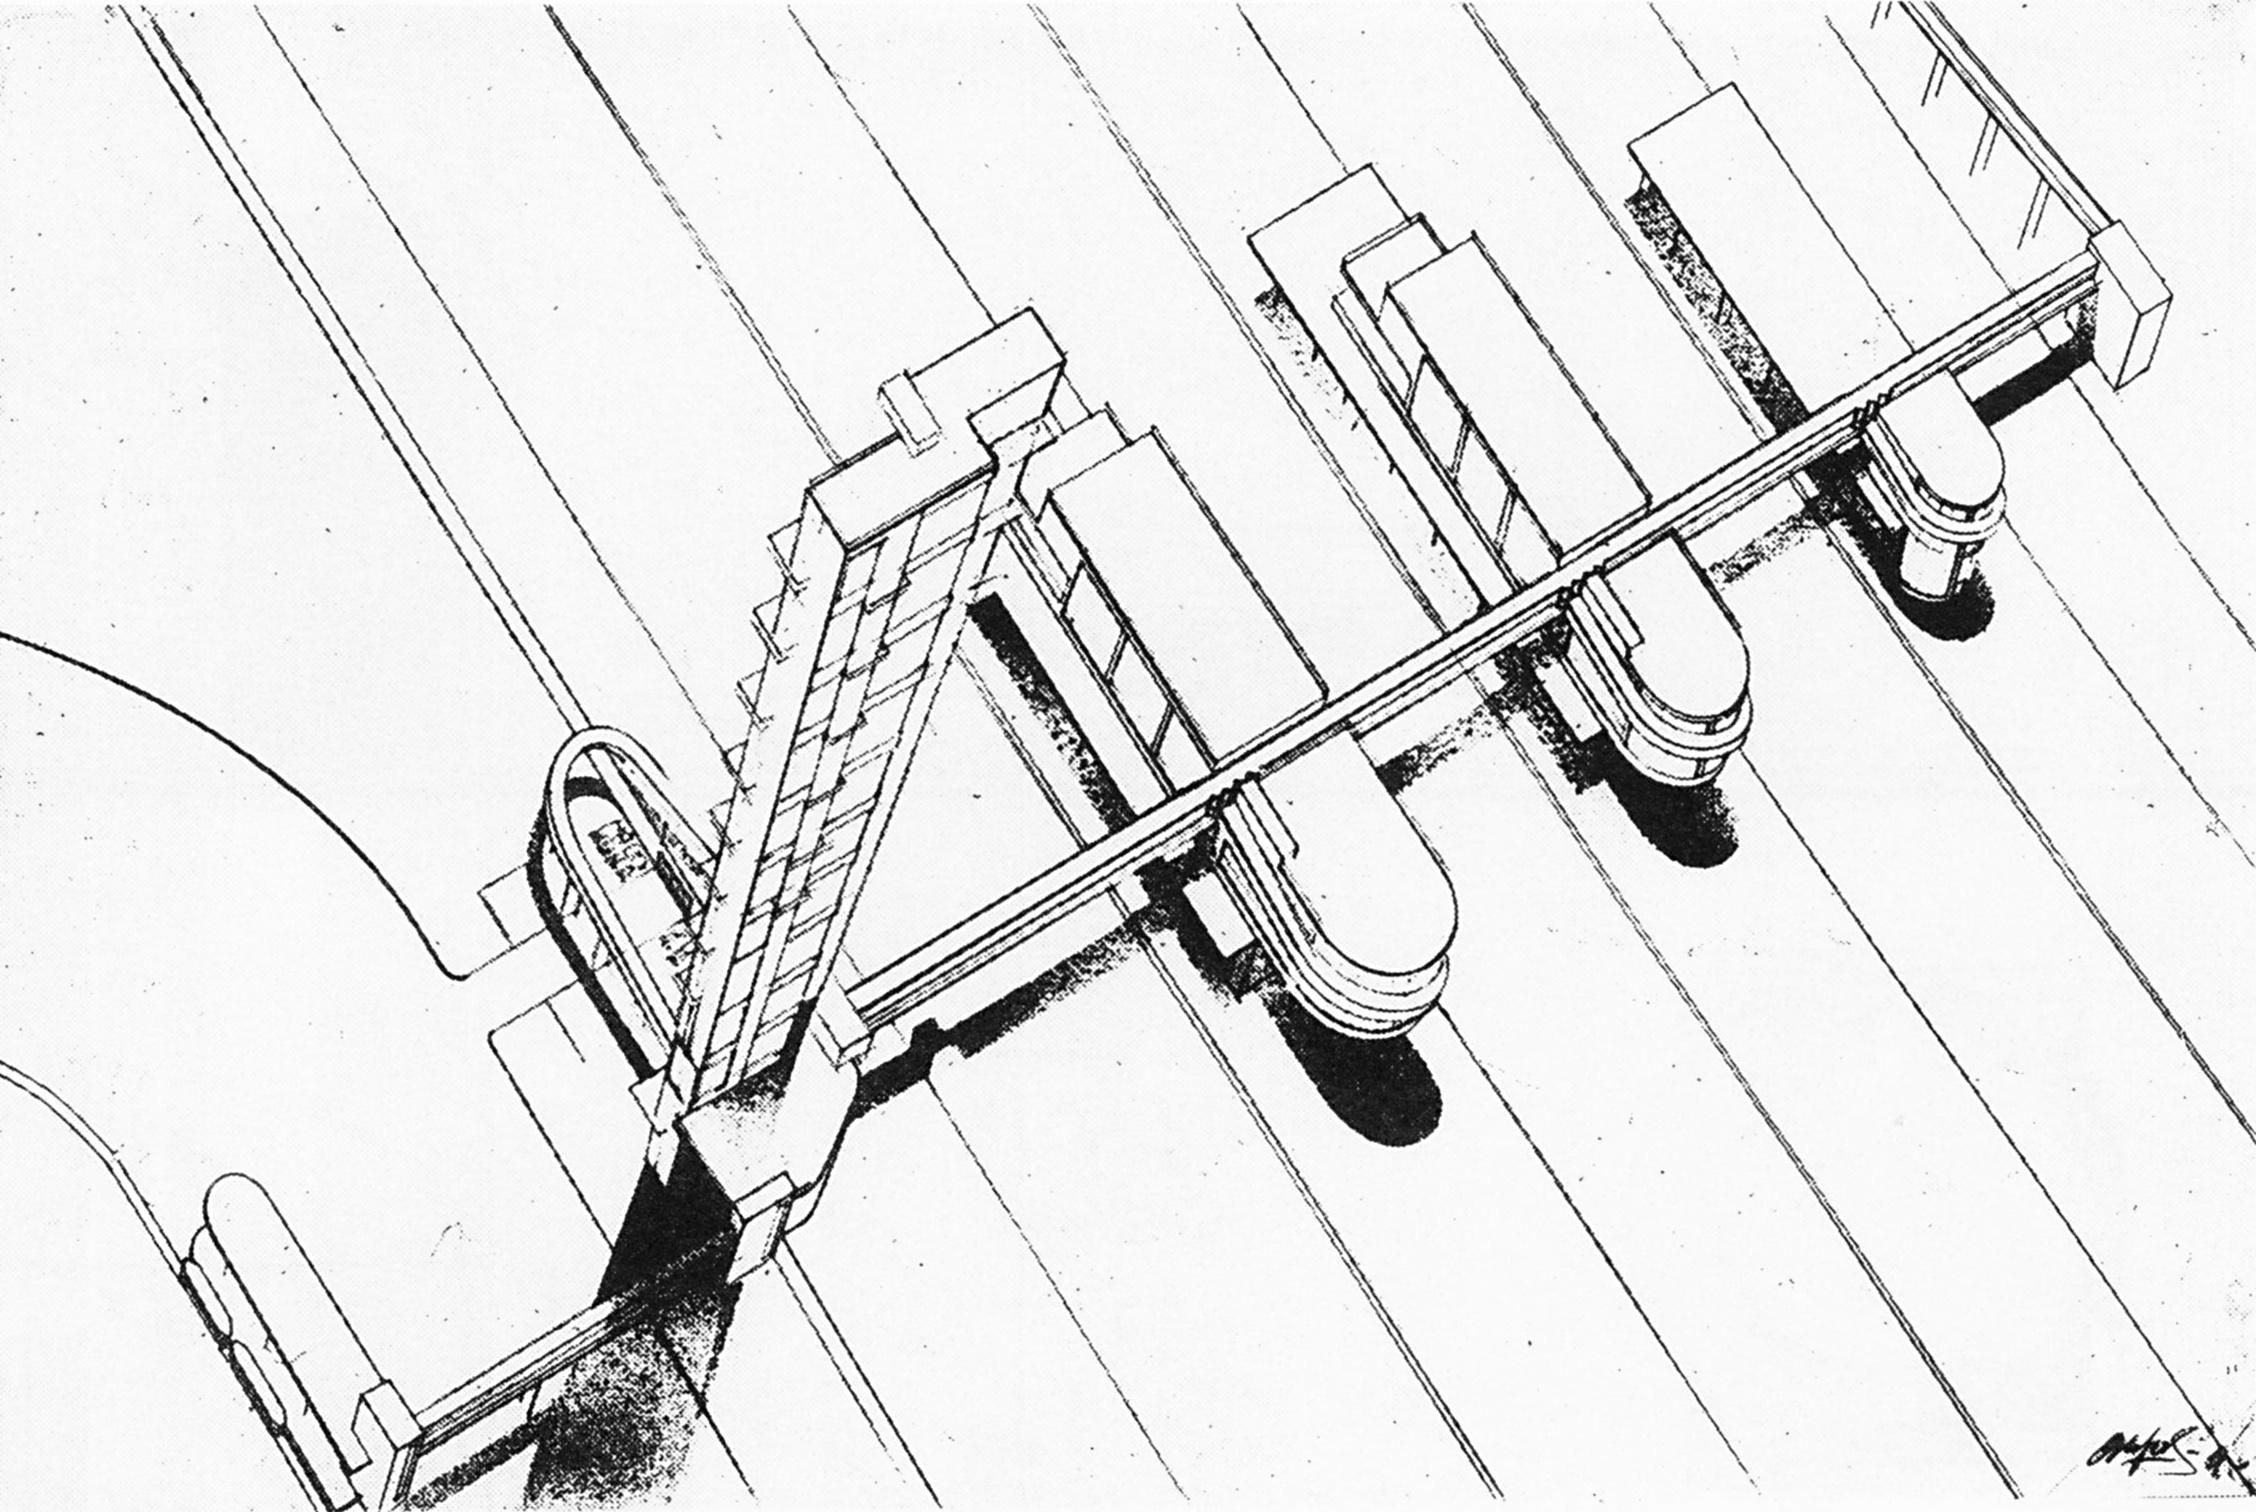 Suvorov, studio of Nikolai Ladovskii, perspective view of a train station in Saratov, 1929